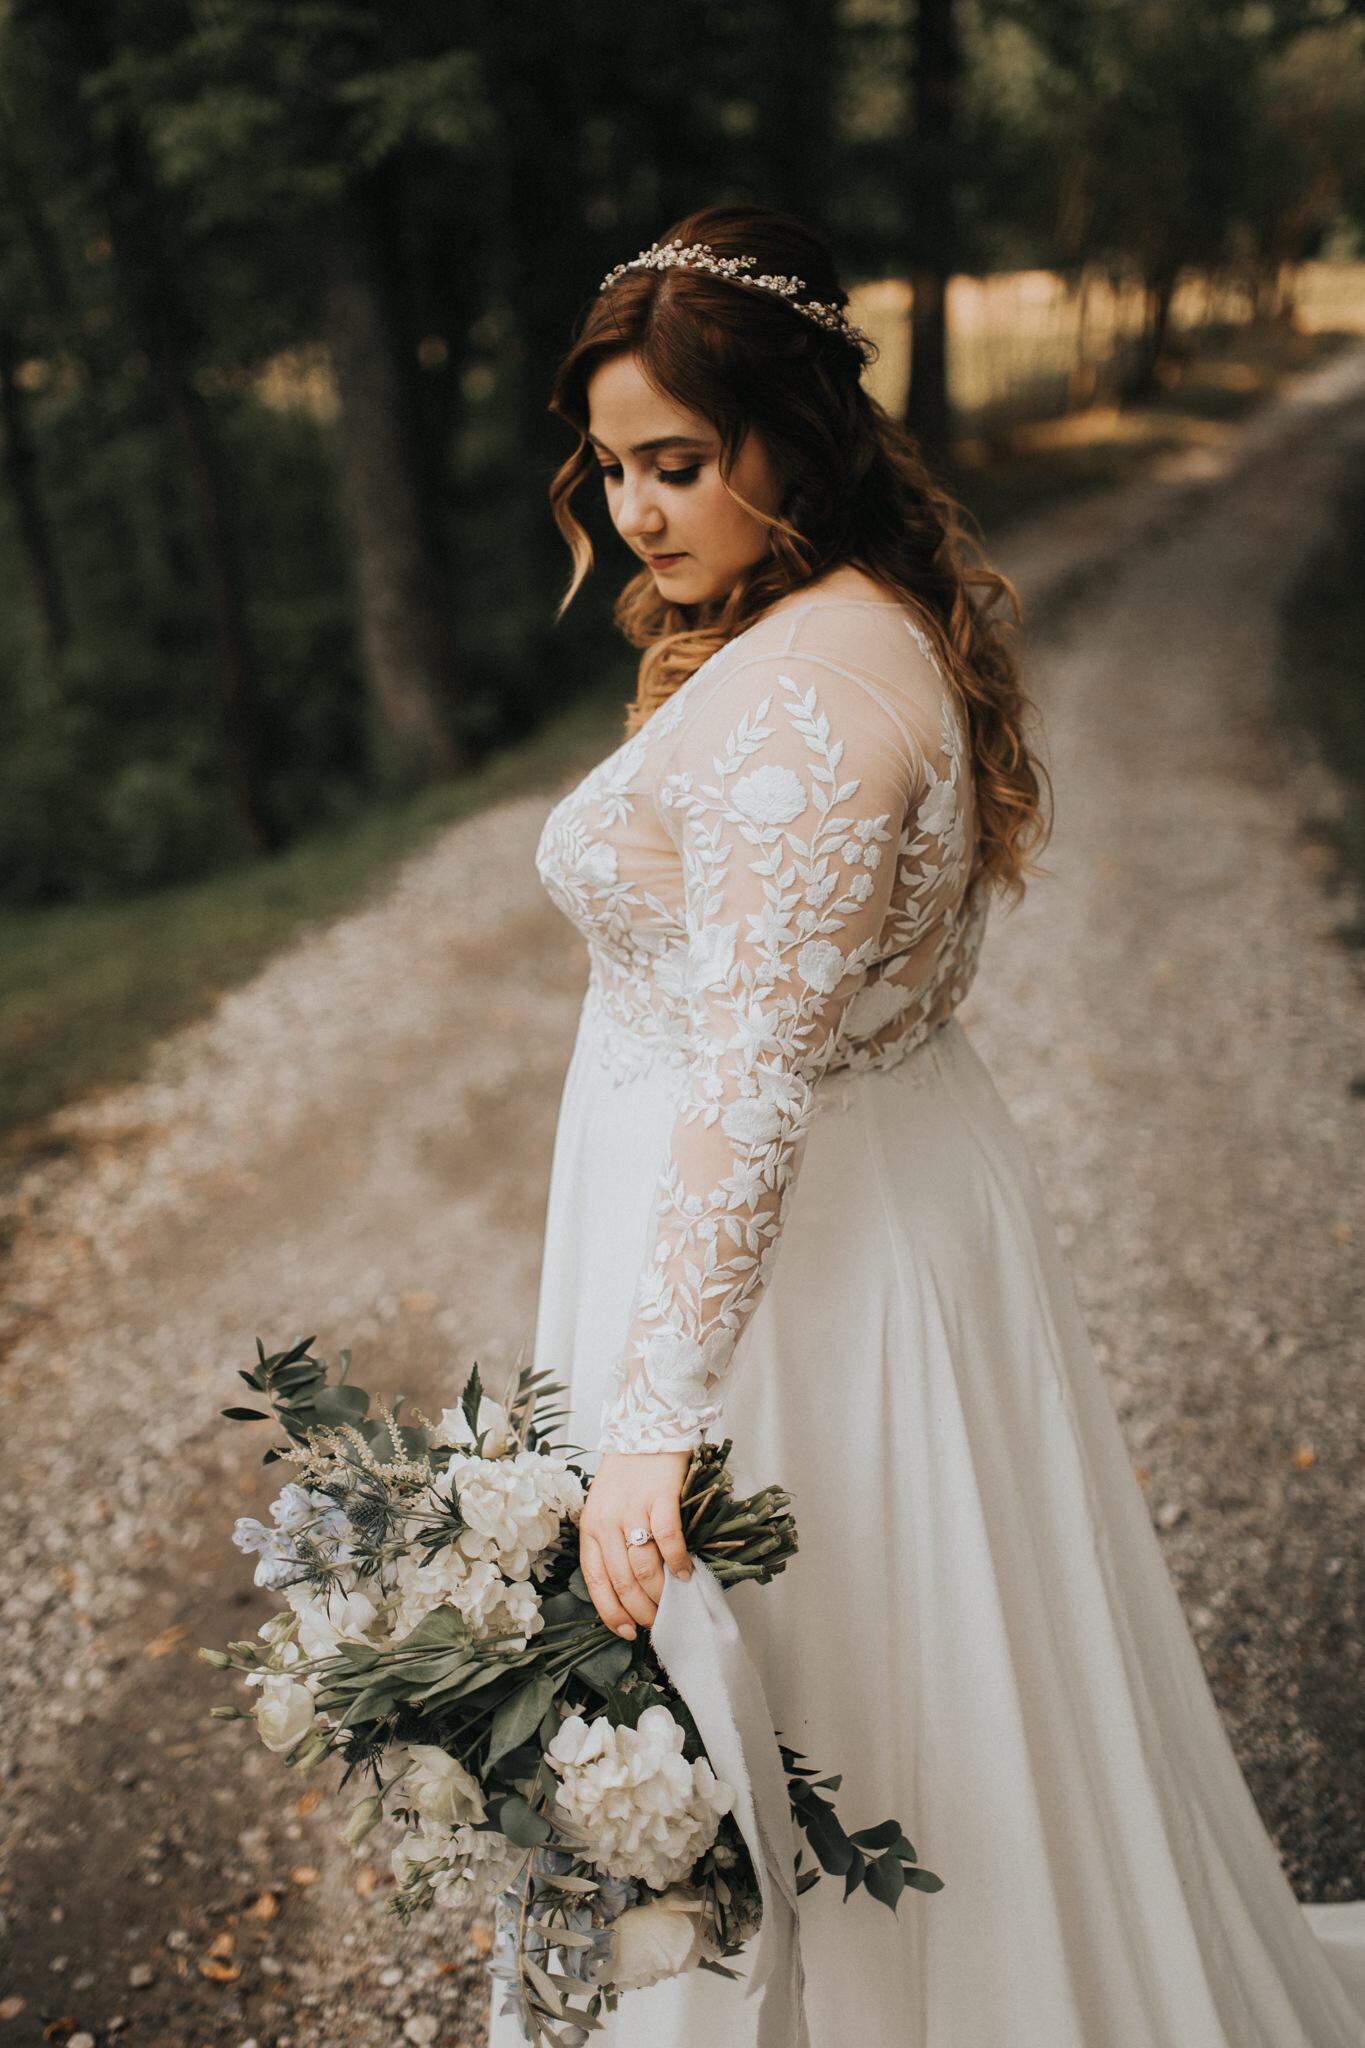 KateMatt-North-Georgia-Wedding-Photographer-Mountain-Laurel-Farm-60.jpg